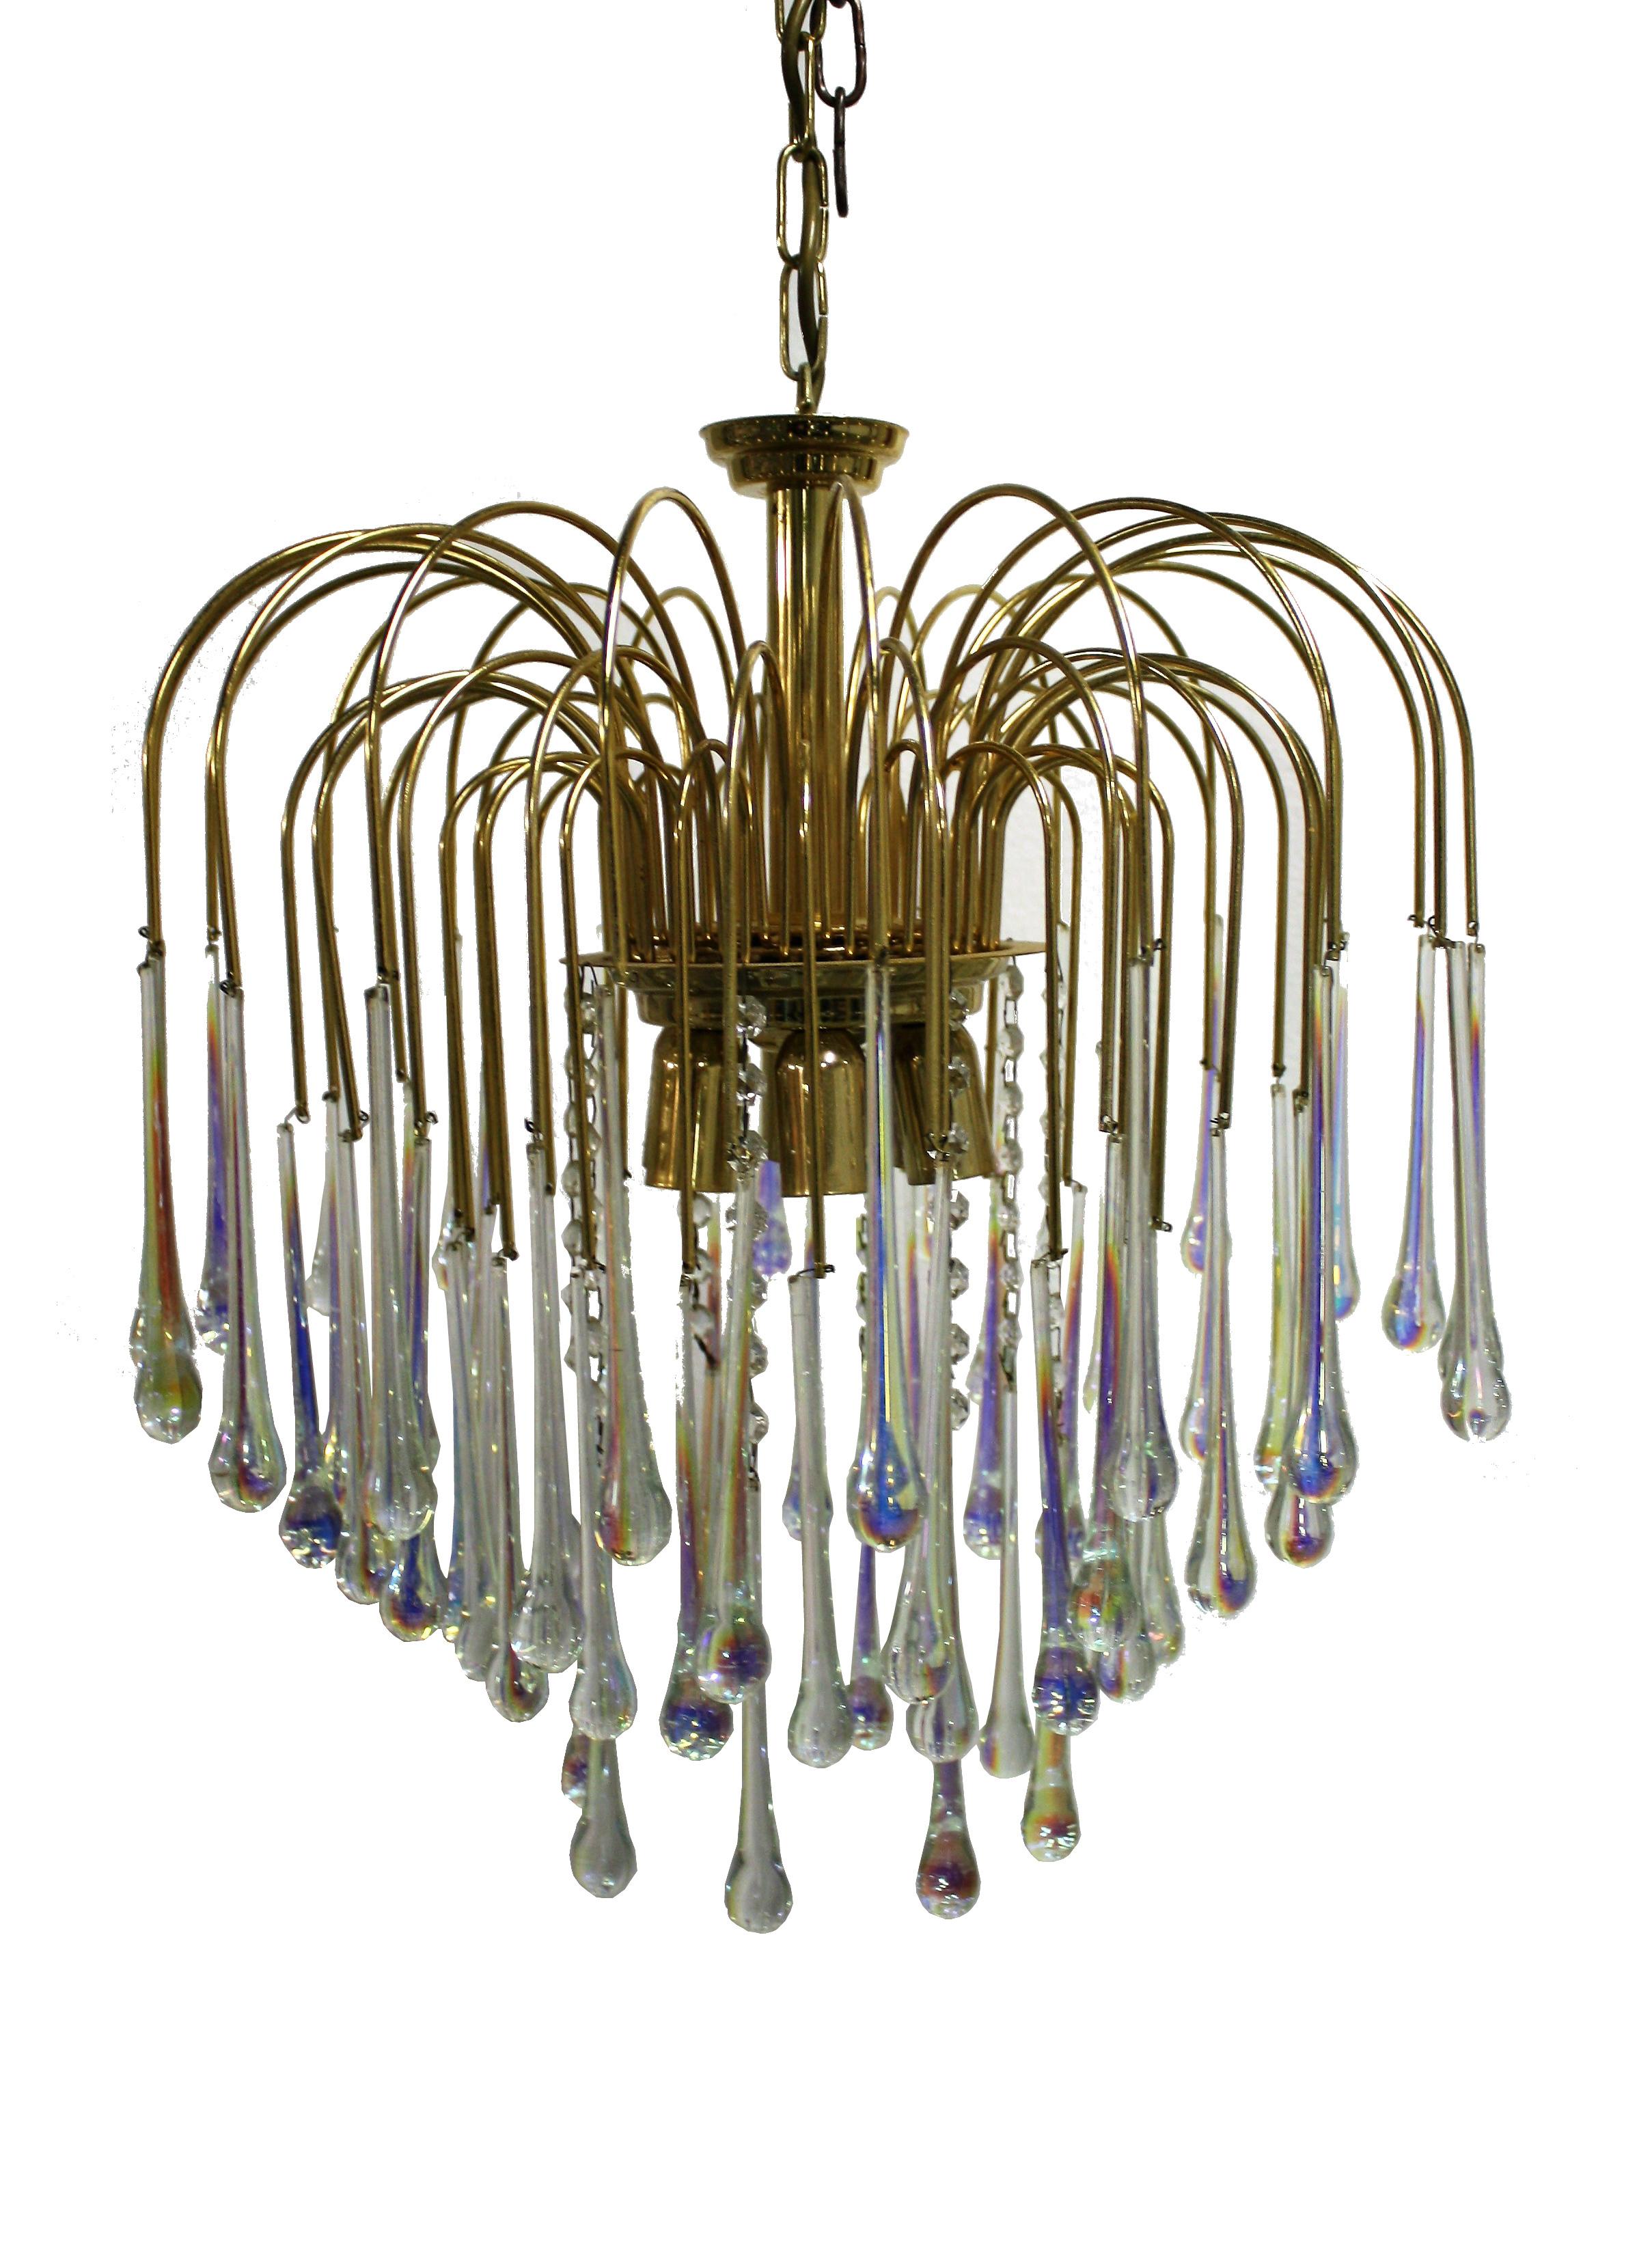 Vintage Brass Teardrop Chandelier with Crystal Murano Glass